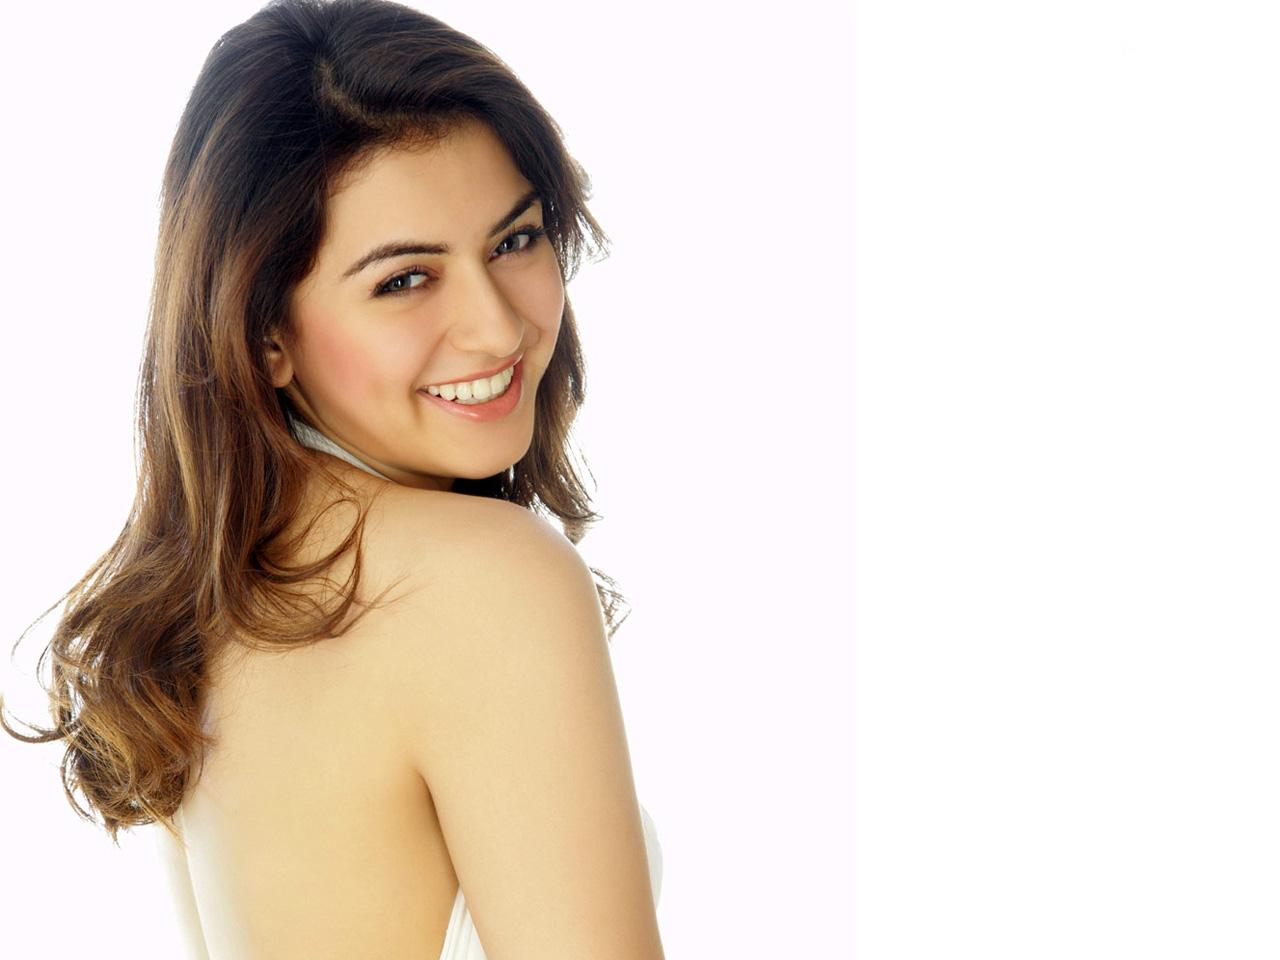 All hd wallpapers actress hansika motwani wallpapers - Indian beautiful models hd wallpapers ...